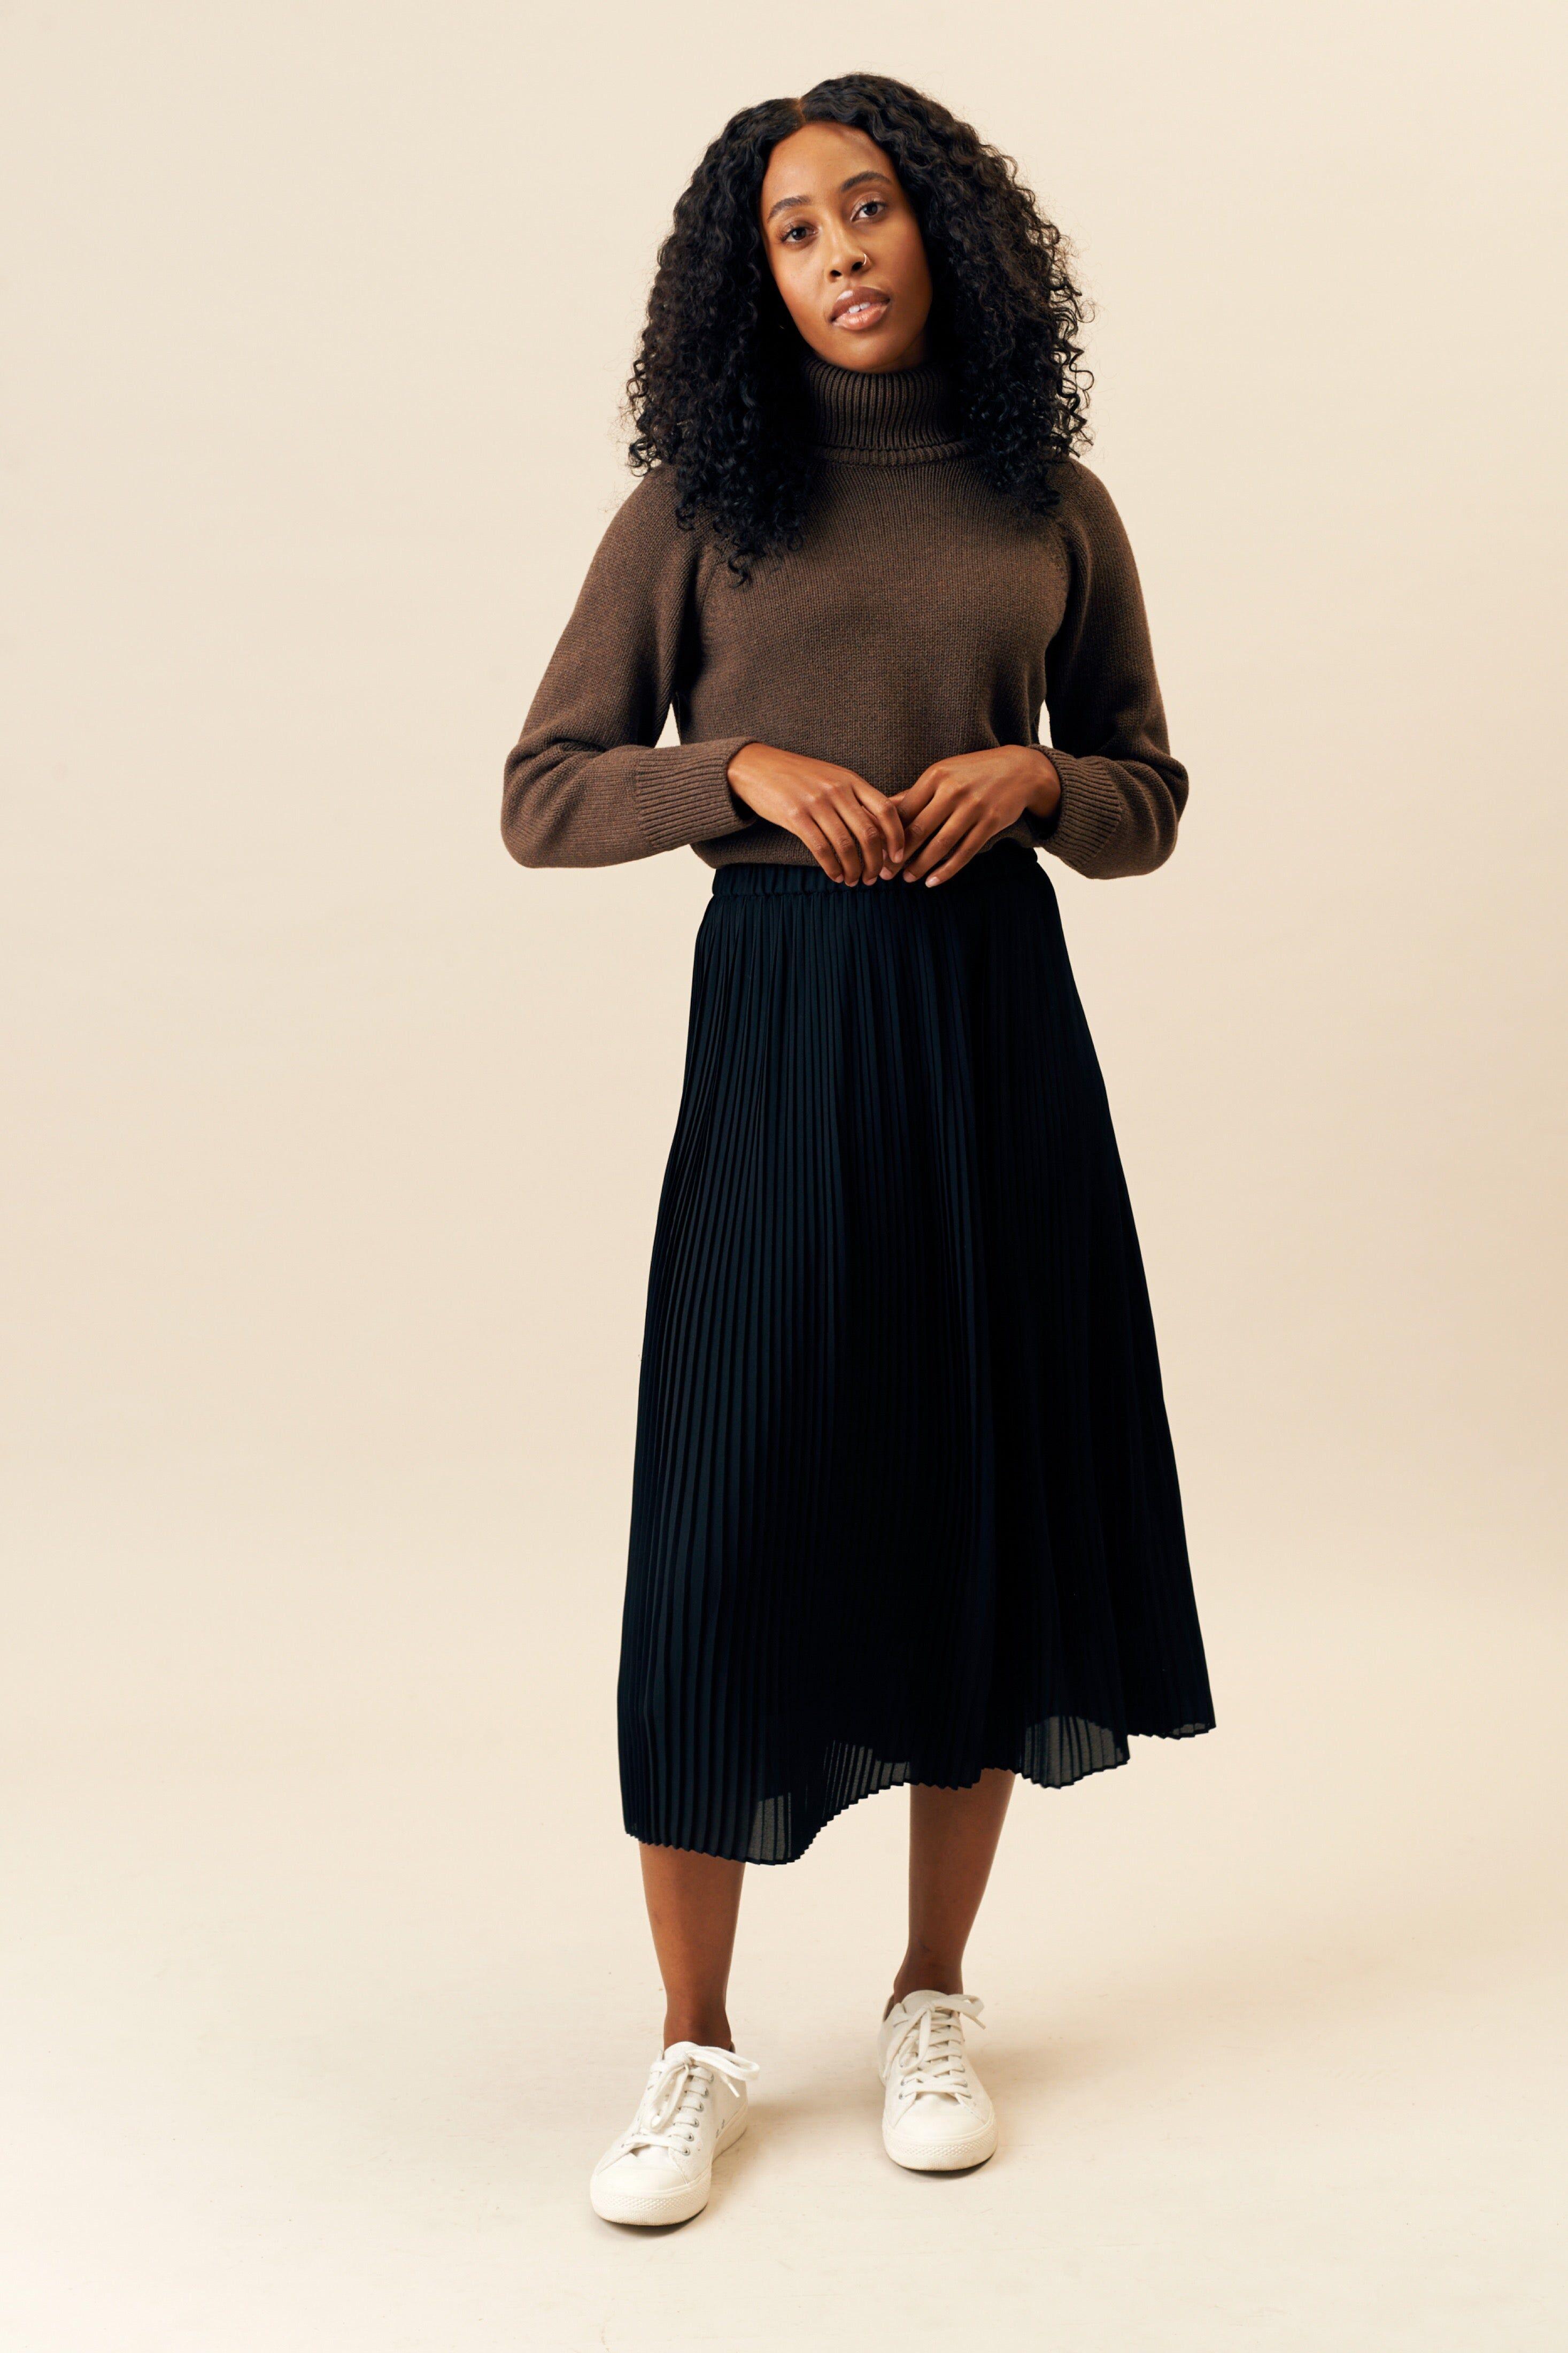 Kotn Women's Turtleneck Top Sweater in Chestnut Brown, Size 2XL